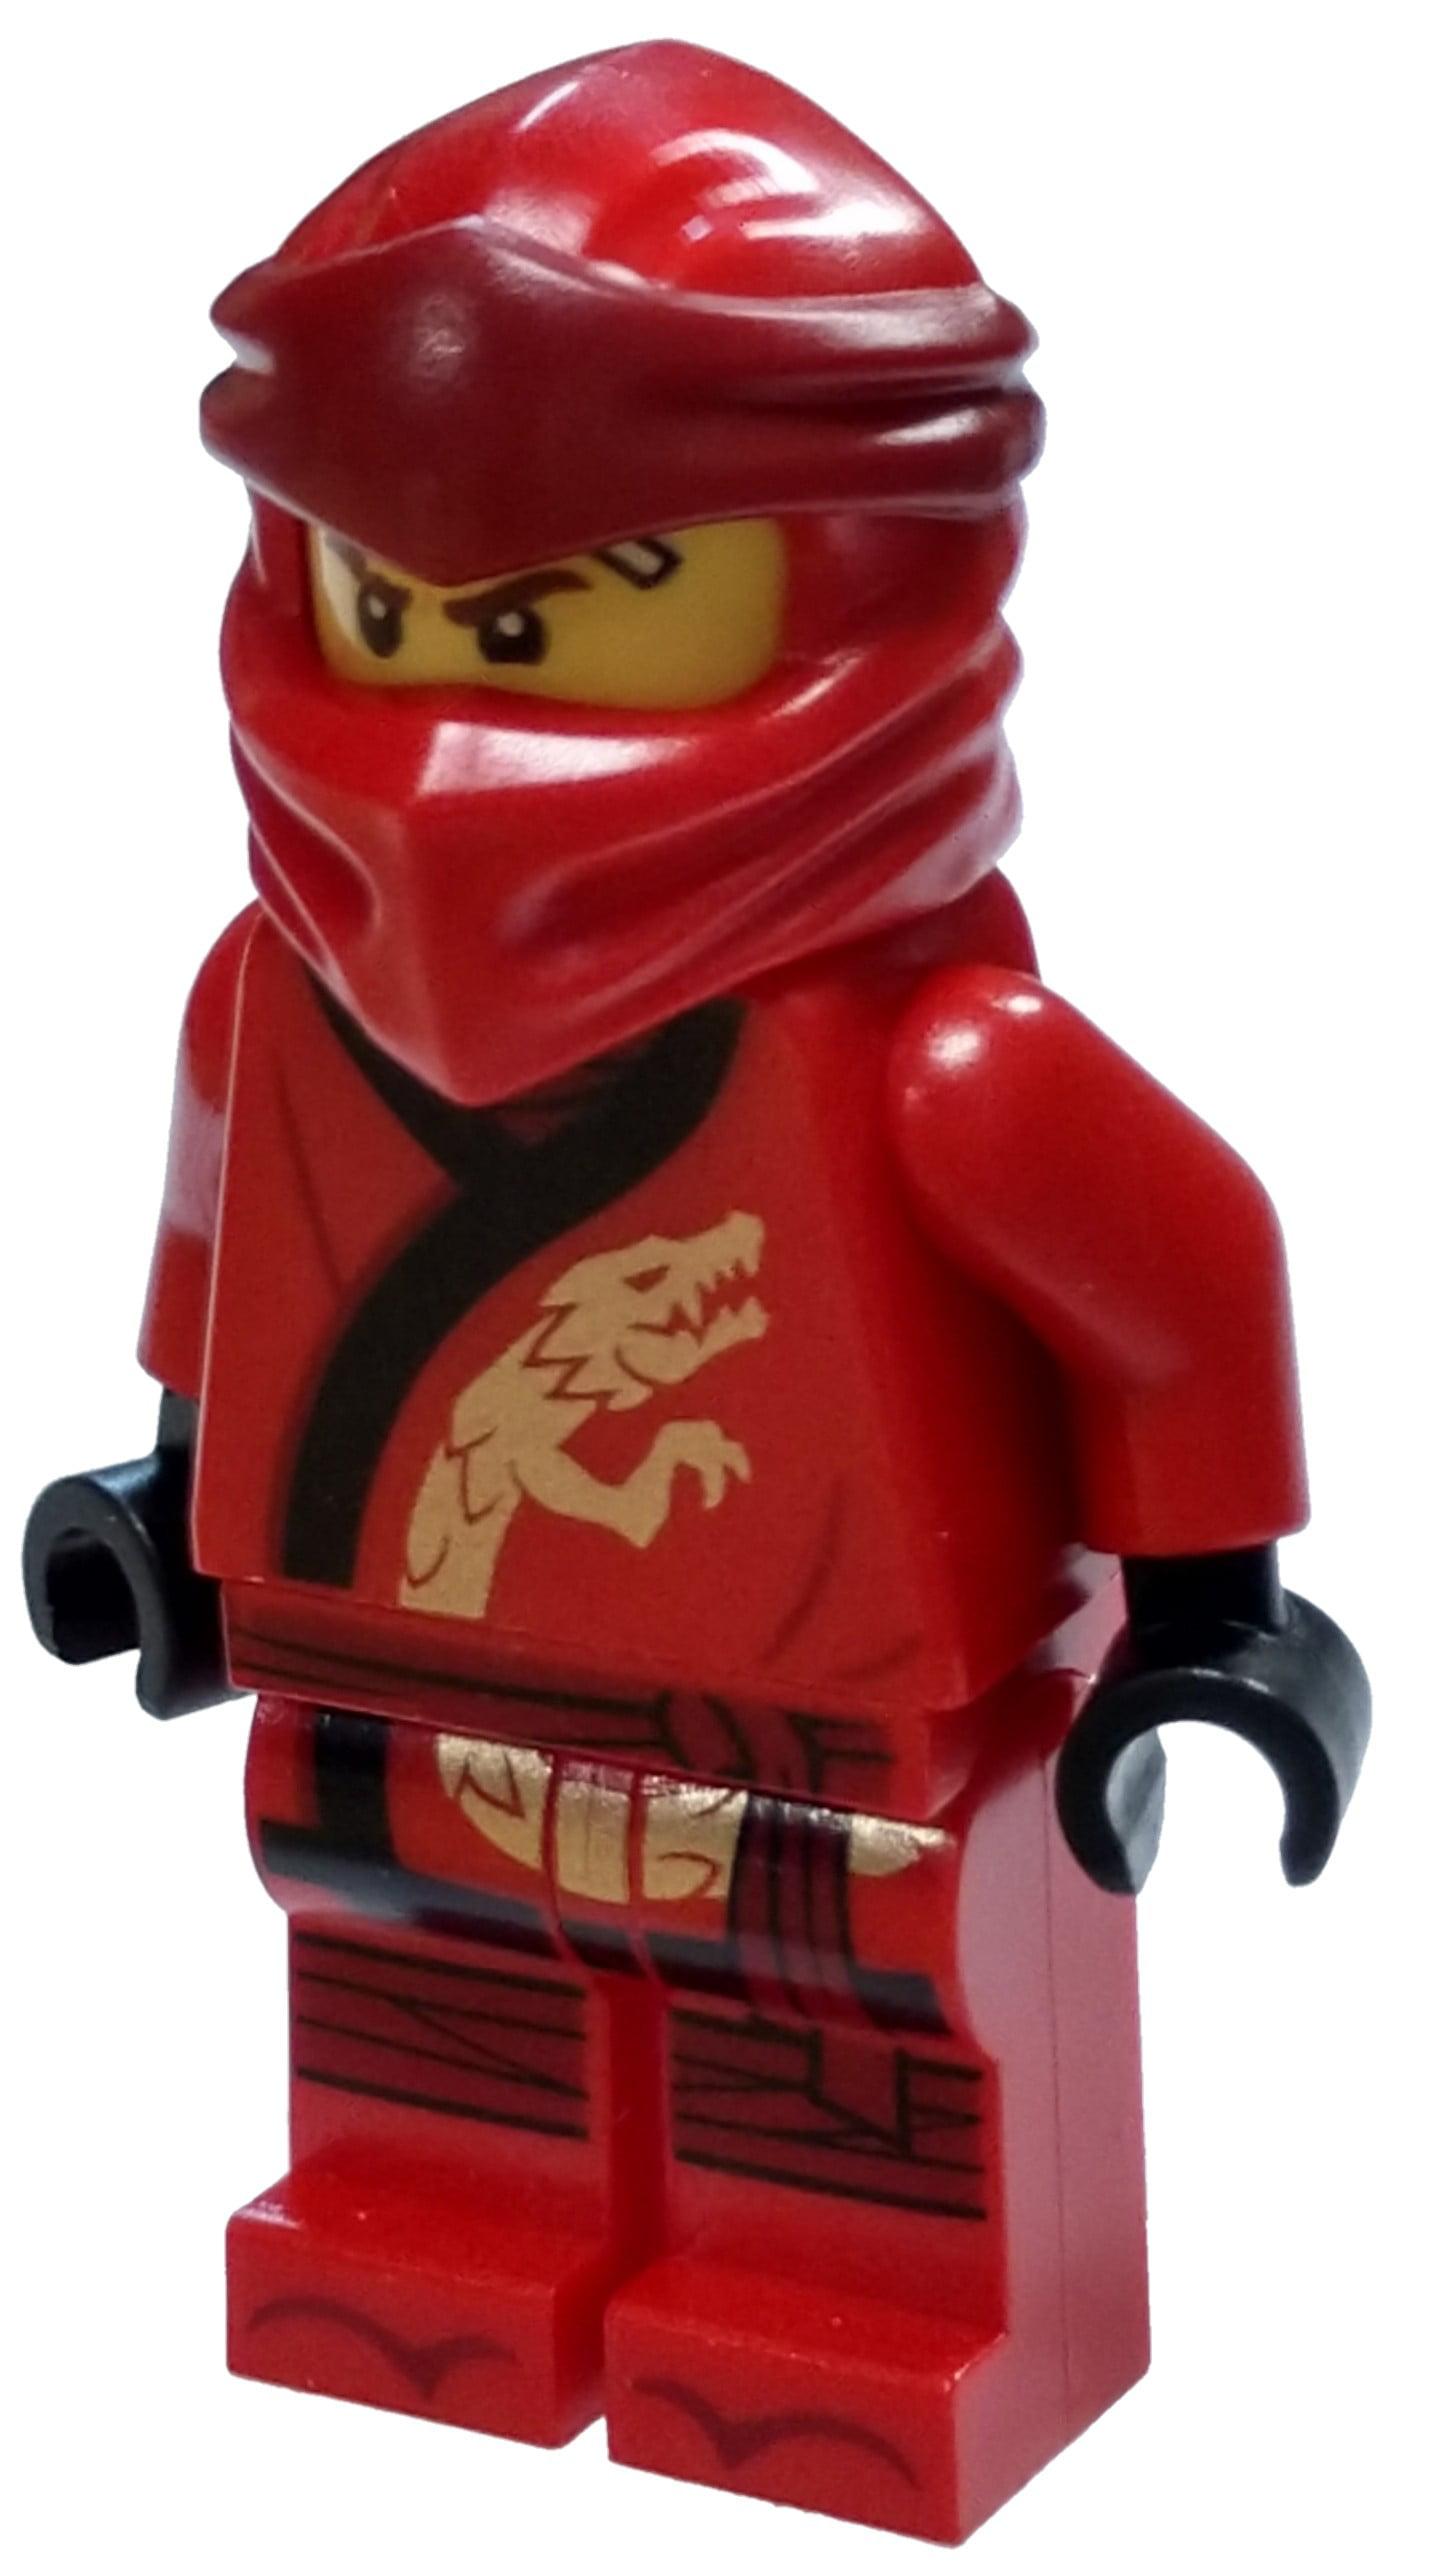 lego ninjago legacy kai minifigure no packaging